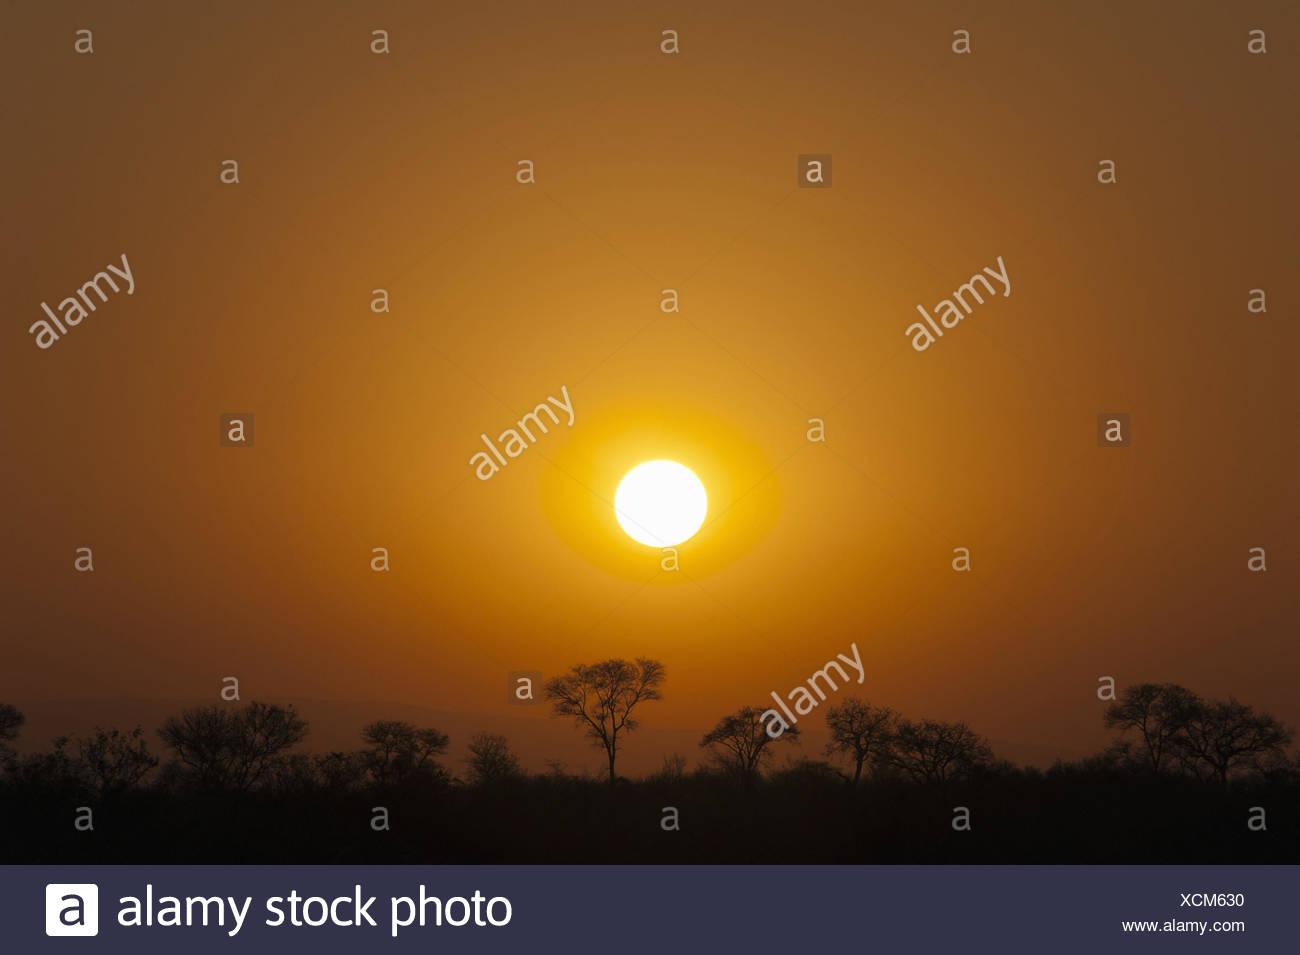 sunset over the savannah, South Africa, Krueger National Park - Stock Image